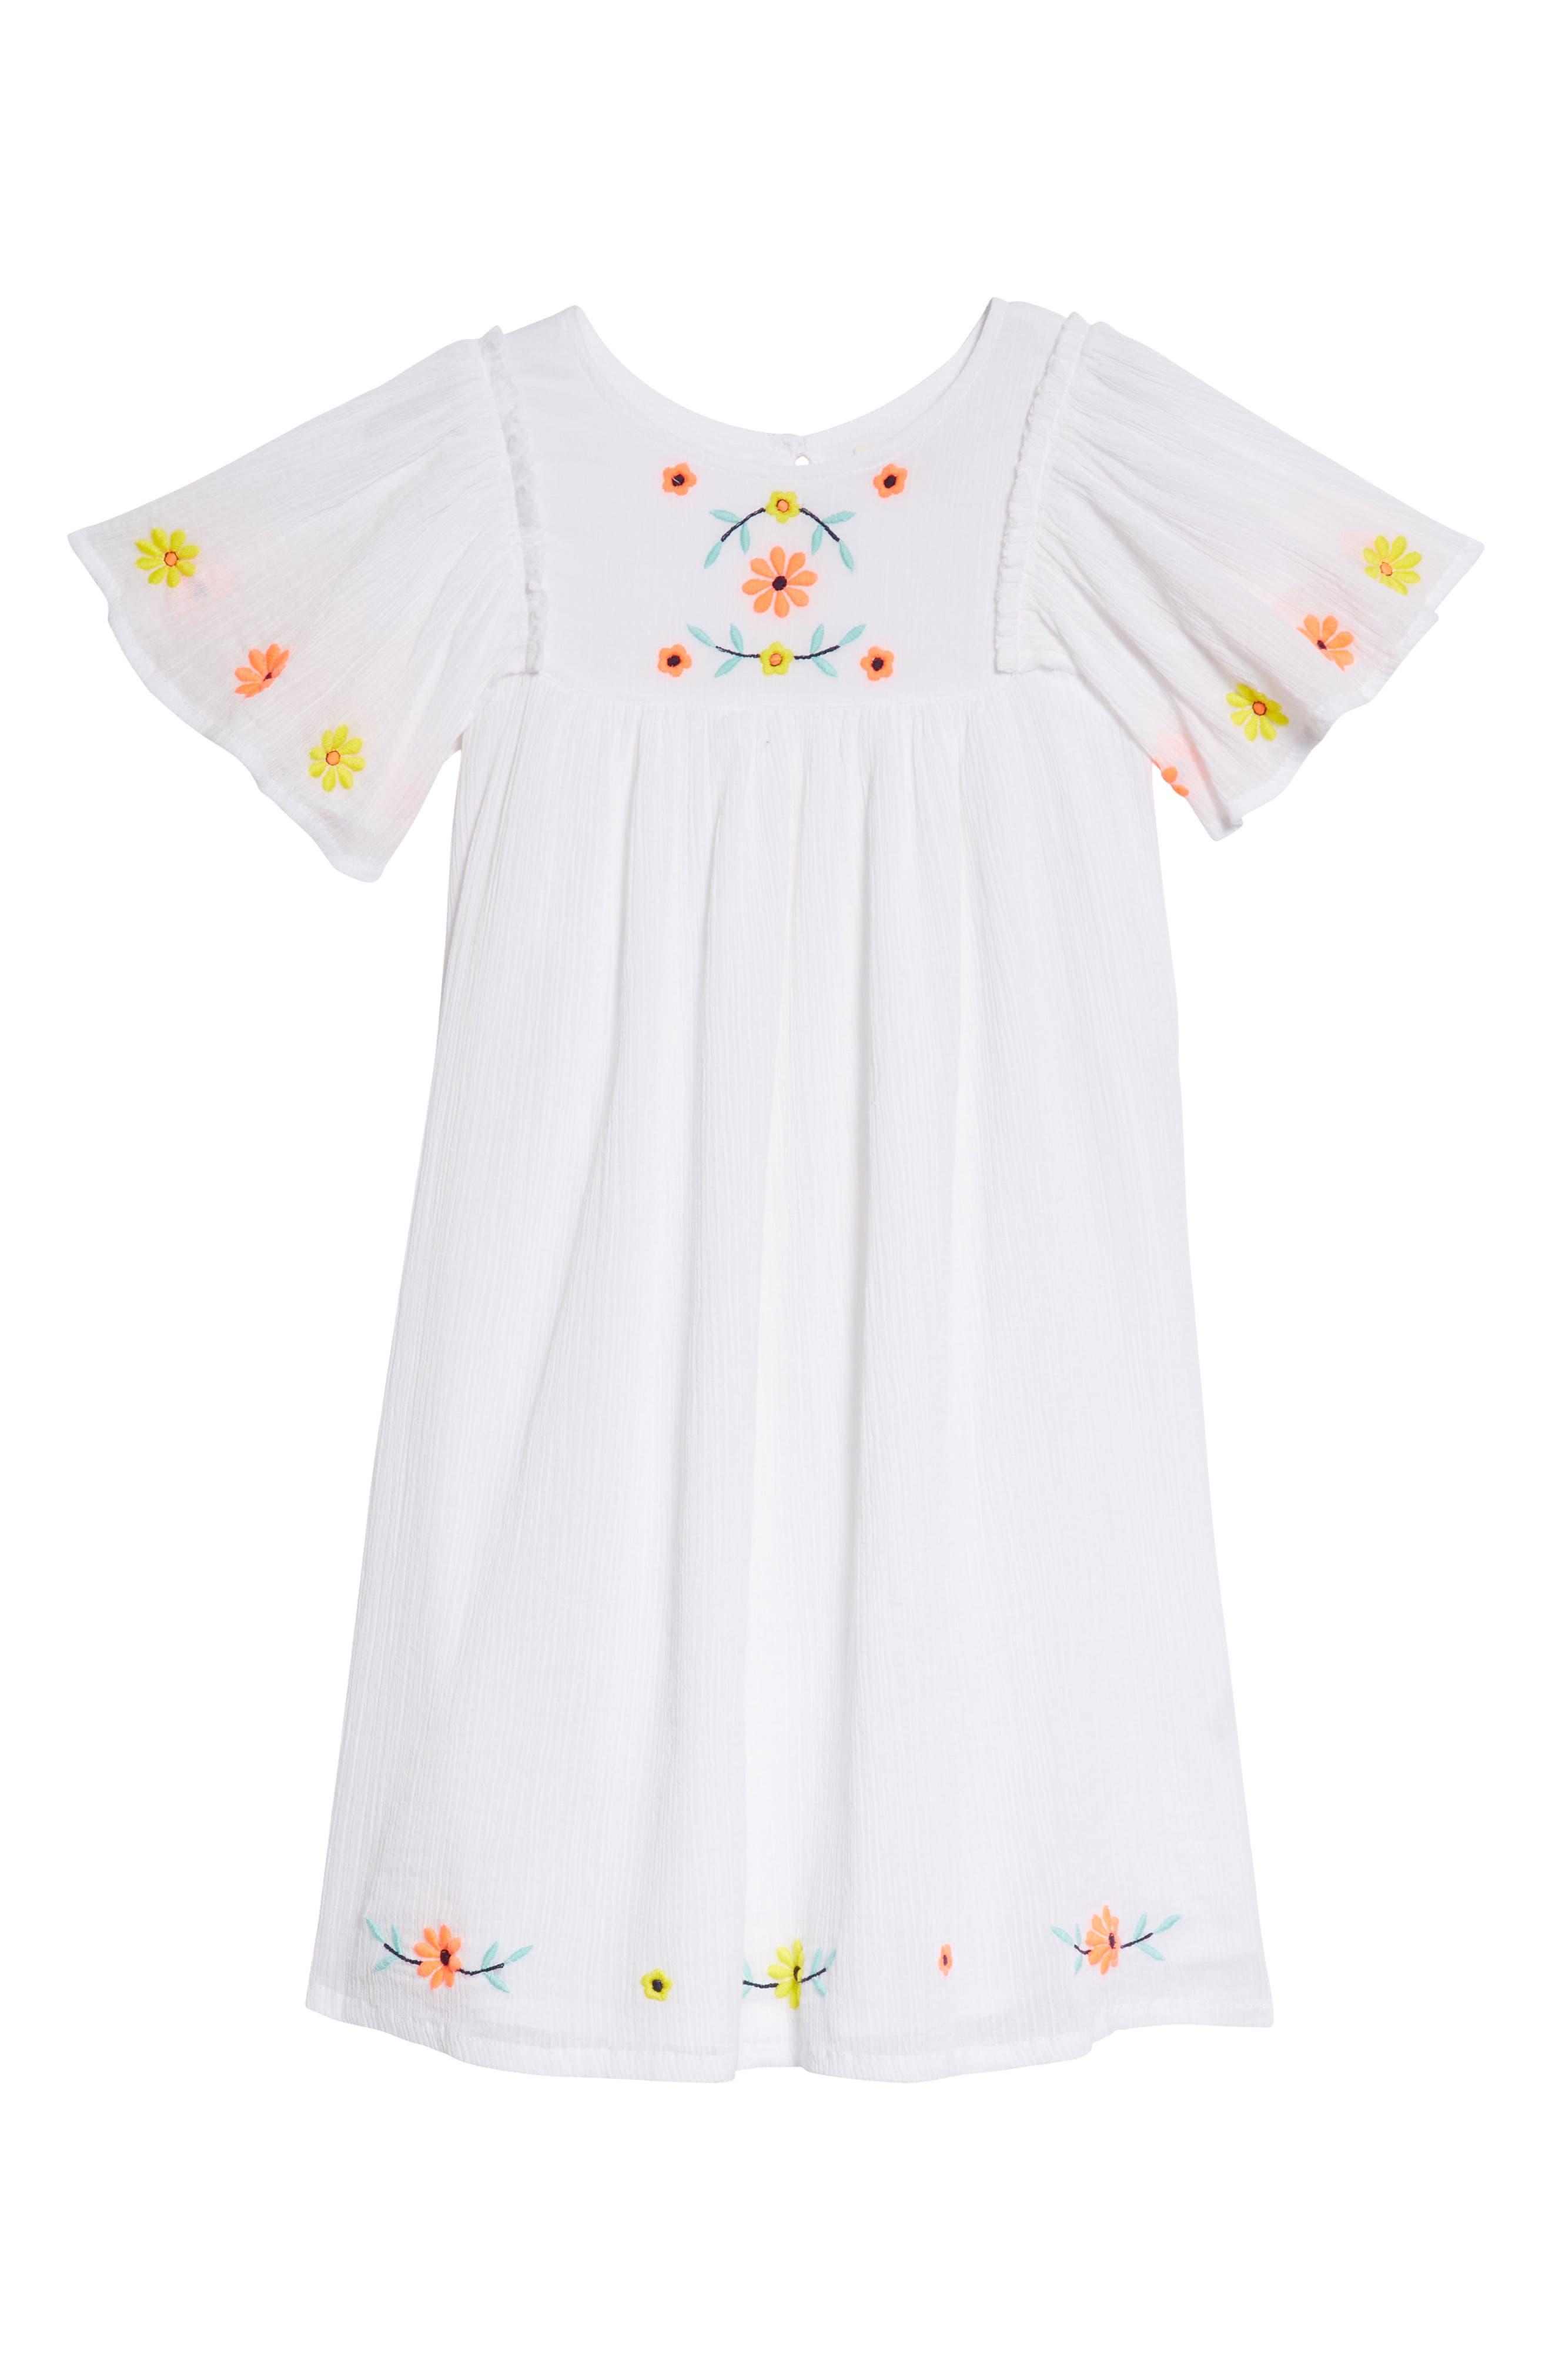 Main Image - Tucker + Tate Embroidered Flutter Sleeve Dress (Toddler Girls, Little Girls & Big Girls)